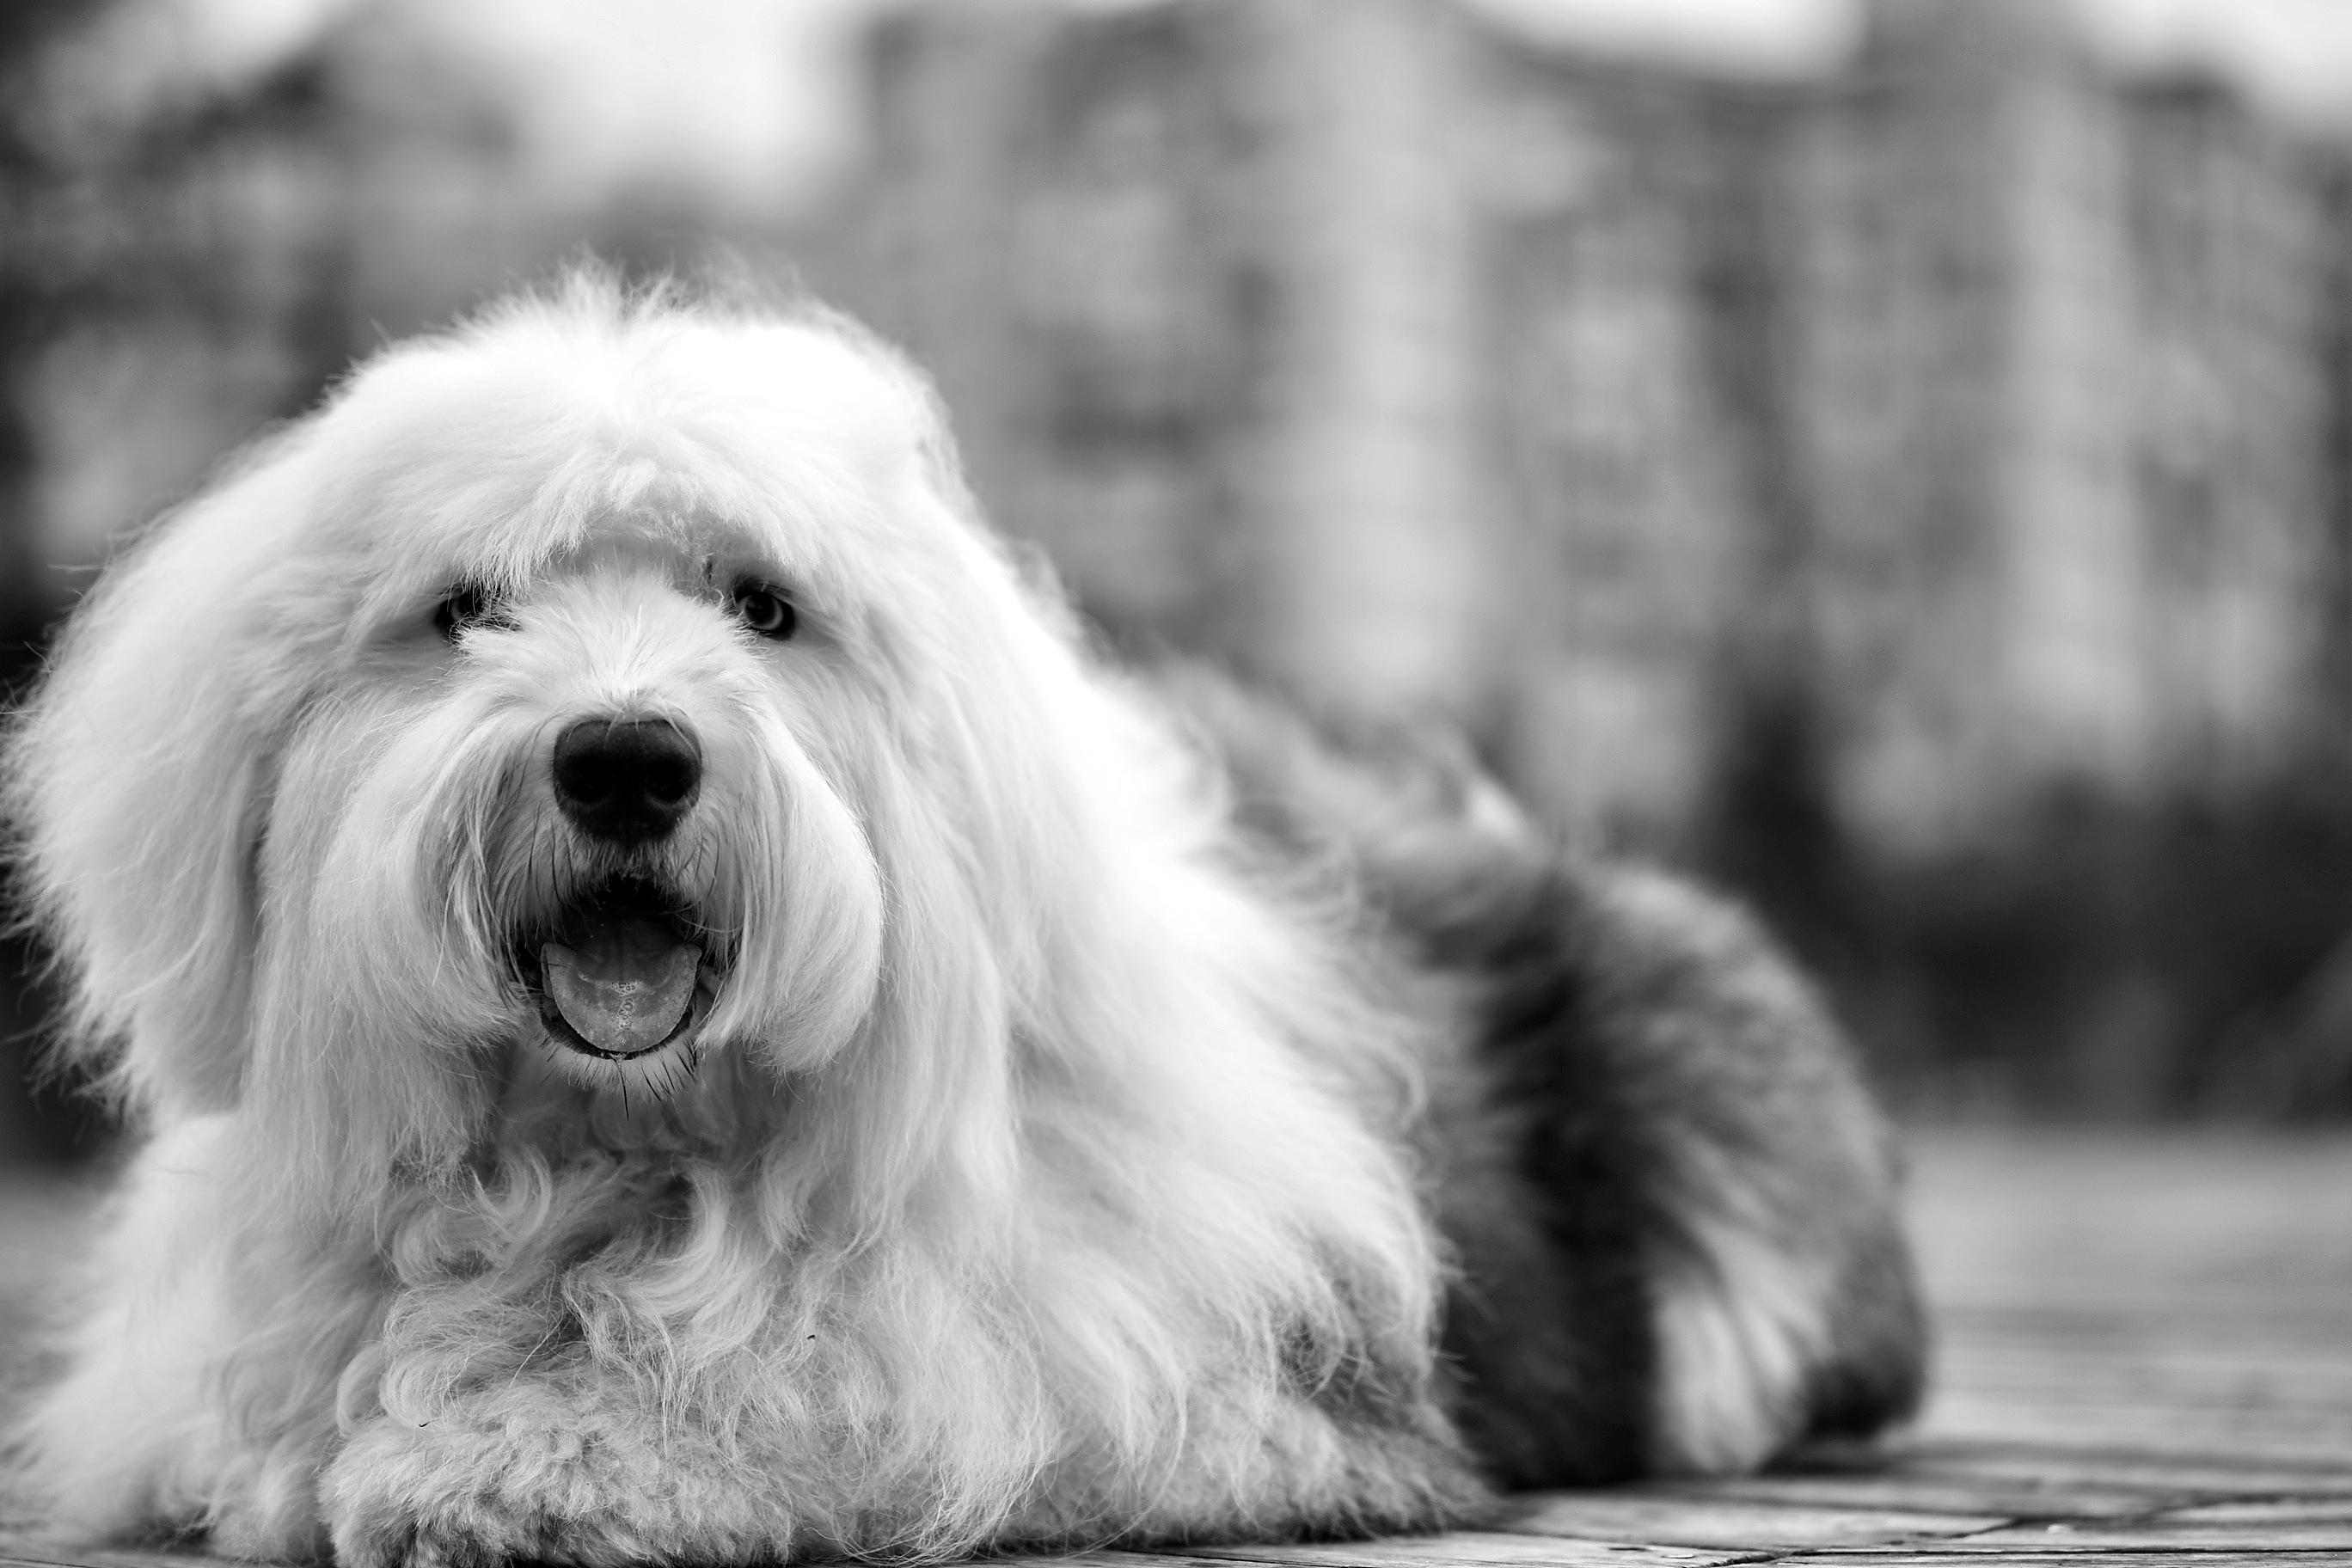 High Definition Animal Wallpapers White Black Old English Sheepdog 183 Free Stock Photo